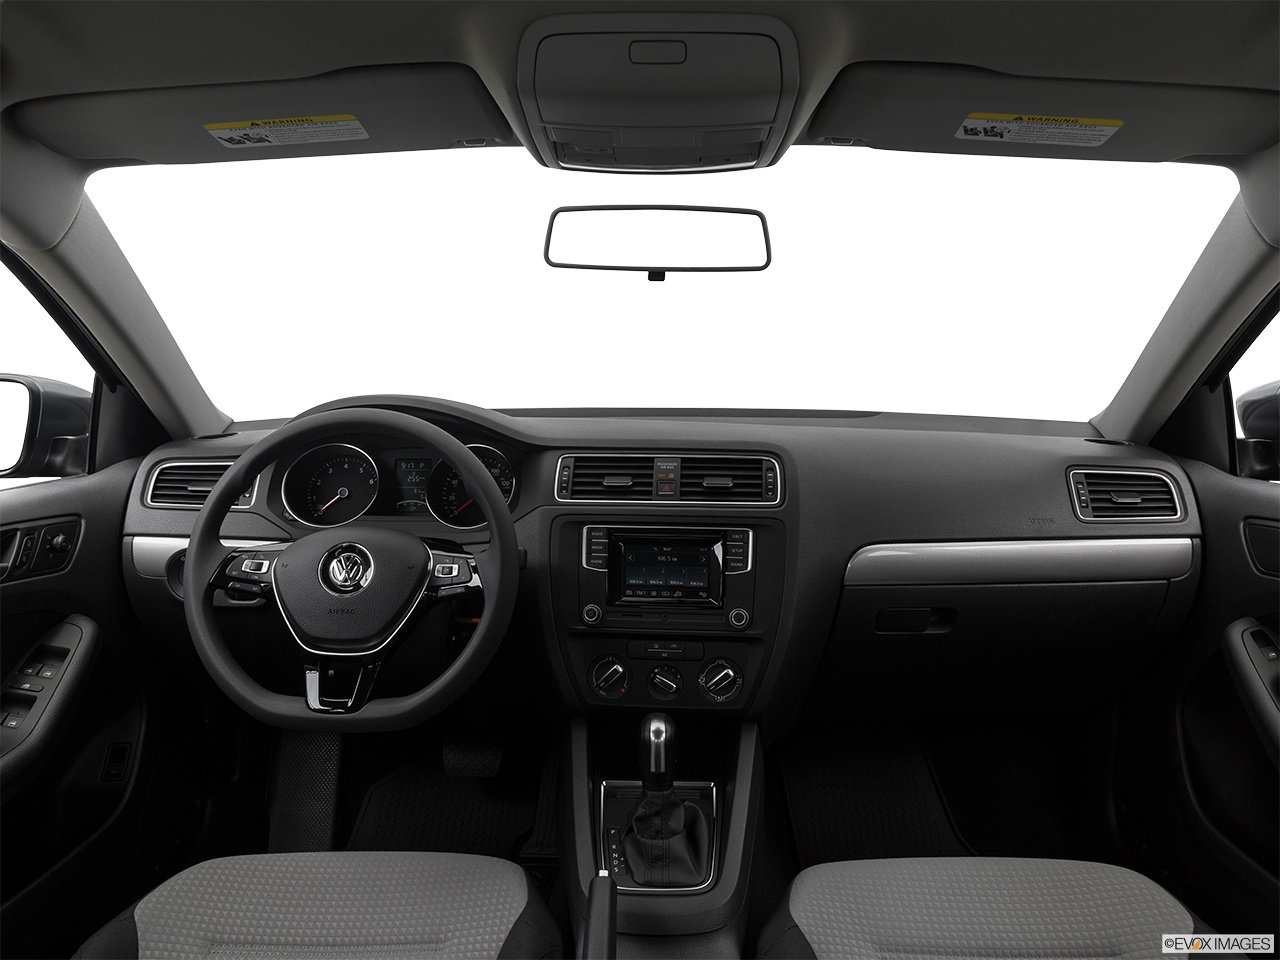 VW vw jetta 1.2 tsi specs : 2017 Volkswagen Jetta Prices in Qatar, Gulf Specs & Reviews for ...